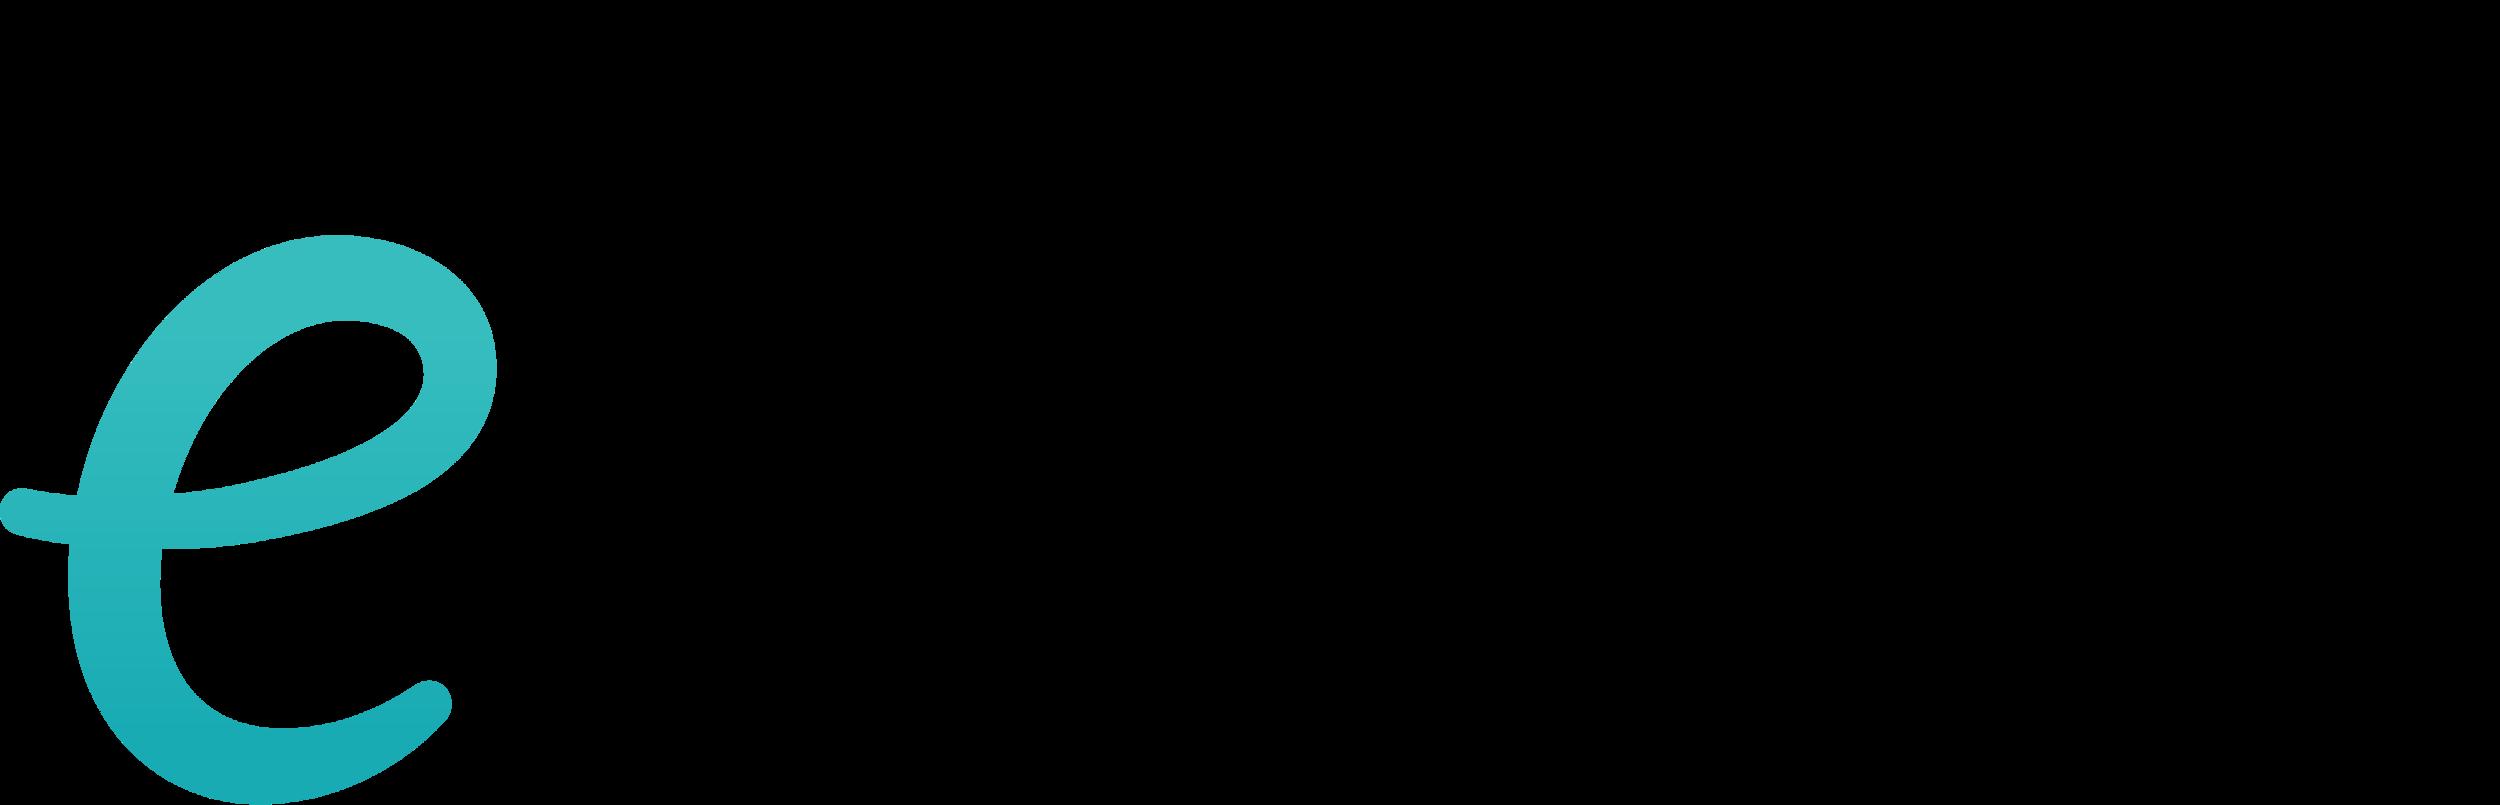 Copy of logo-black e.png